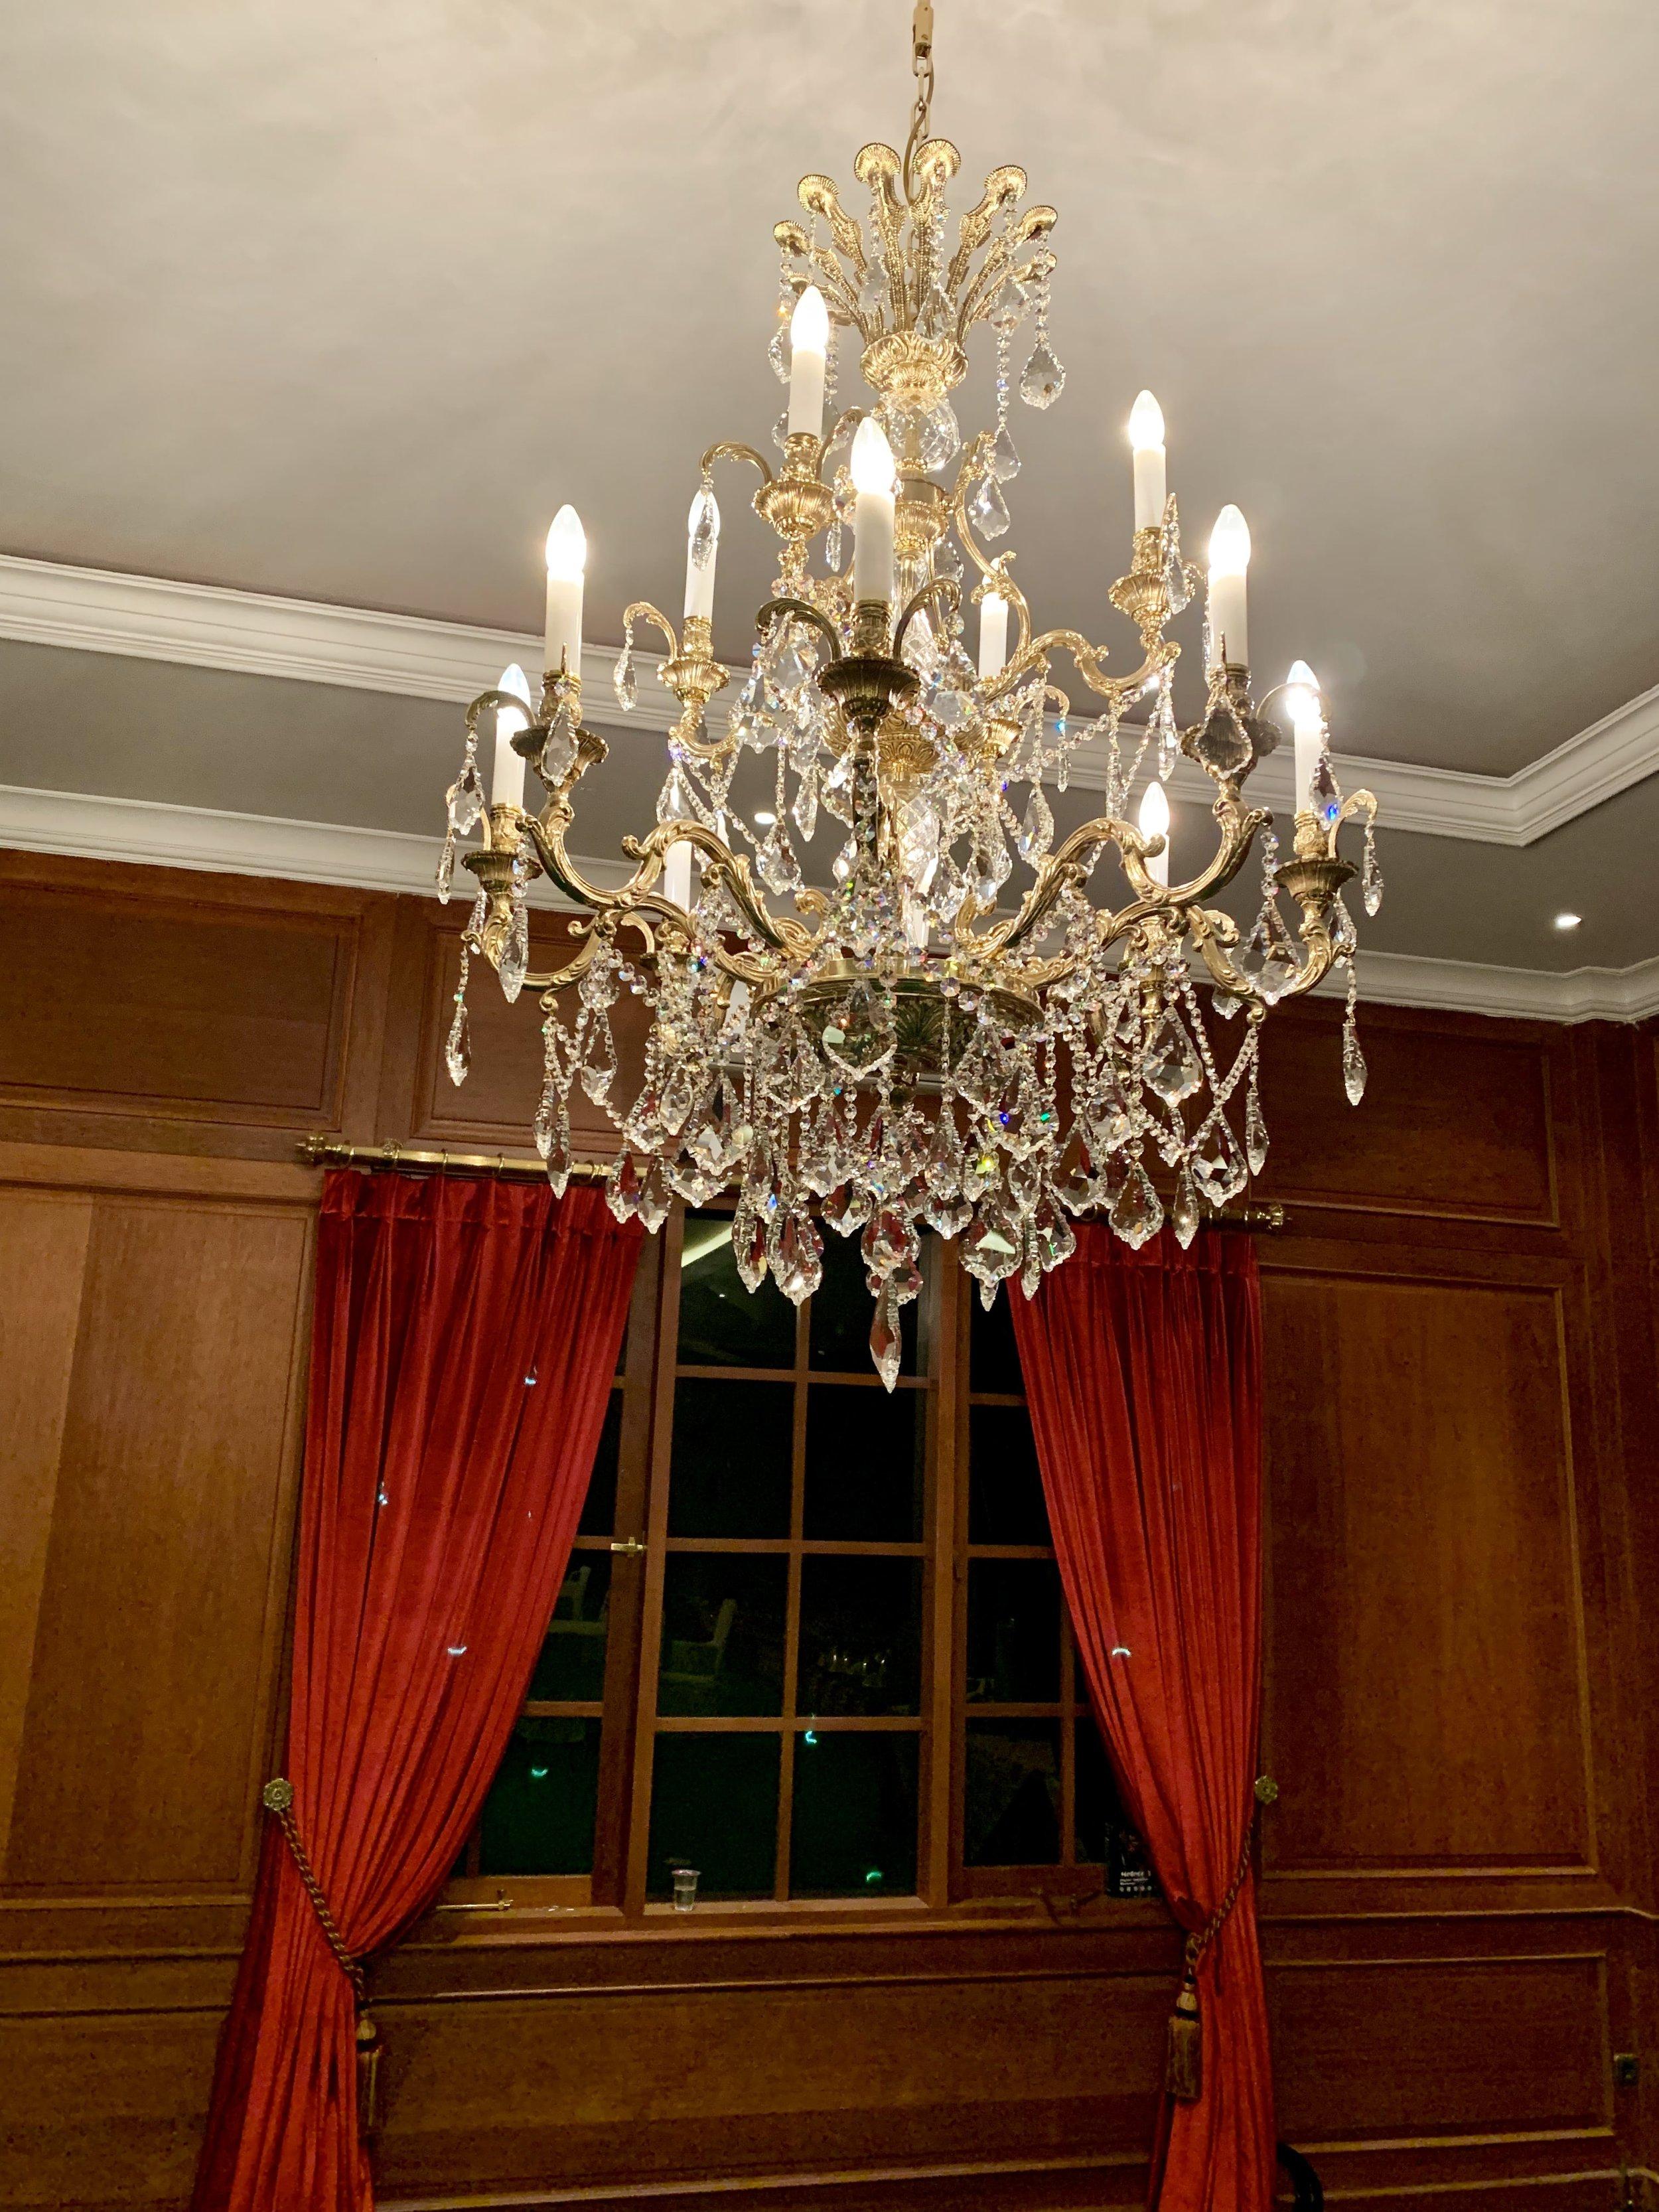 Indonesia-brass-chandelier-wranovsky-1.jpeg